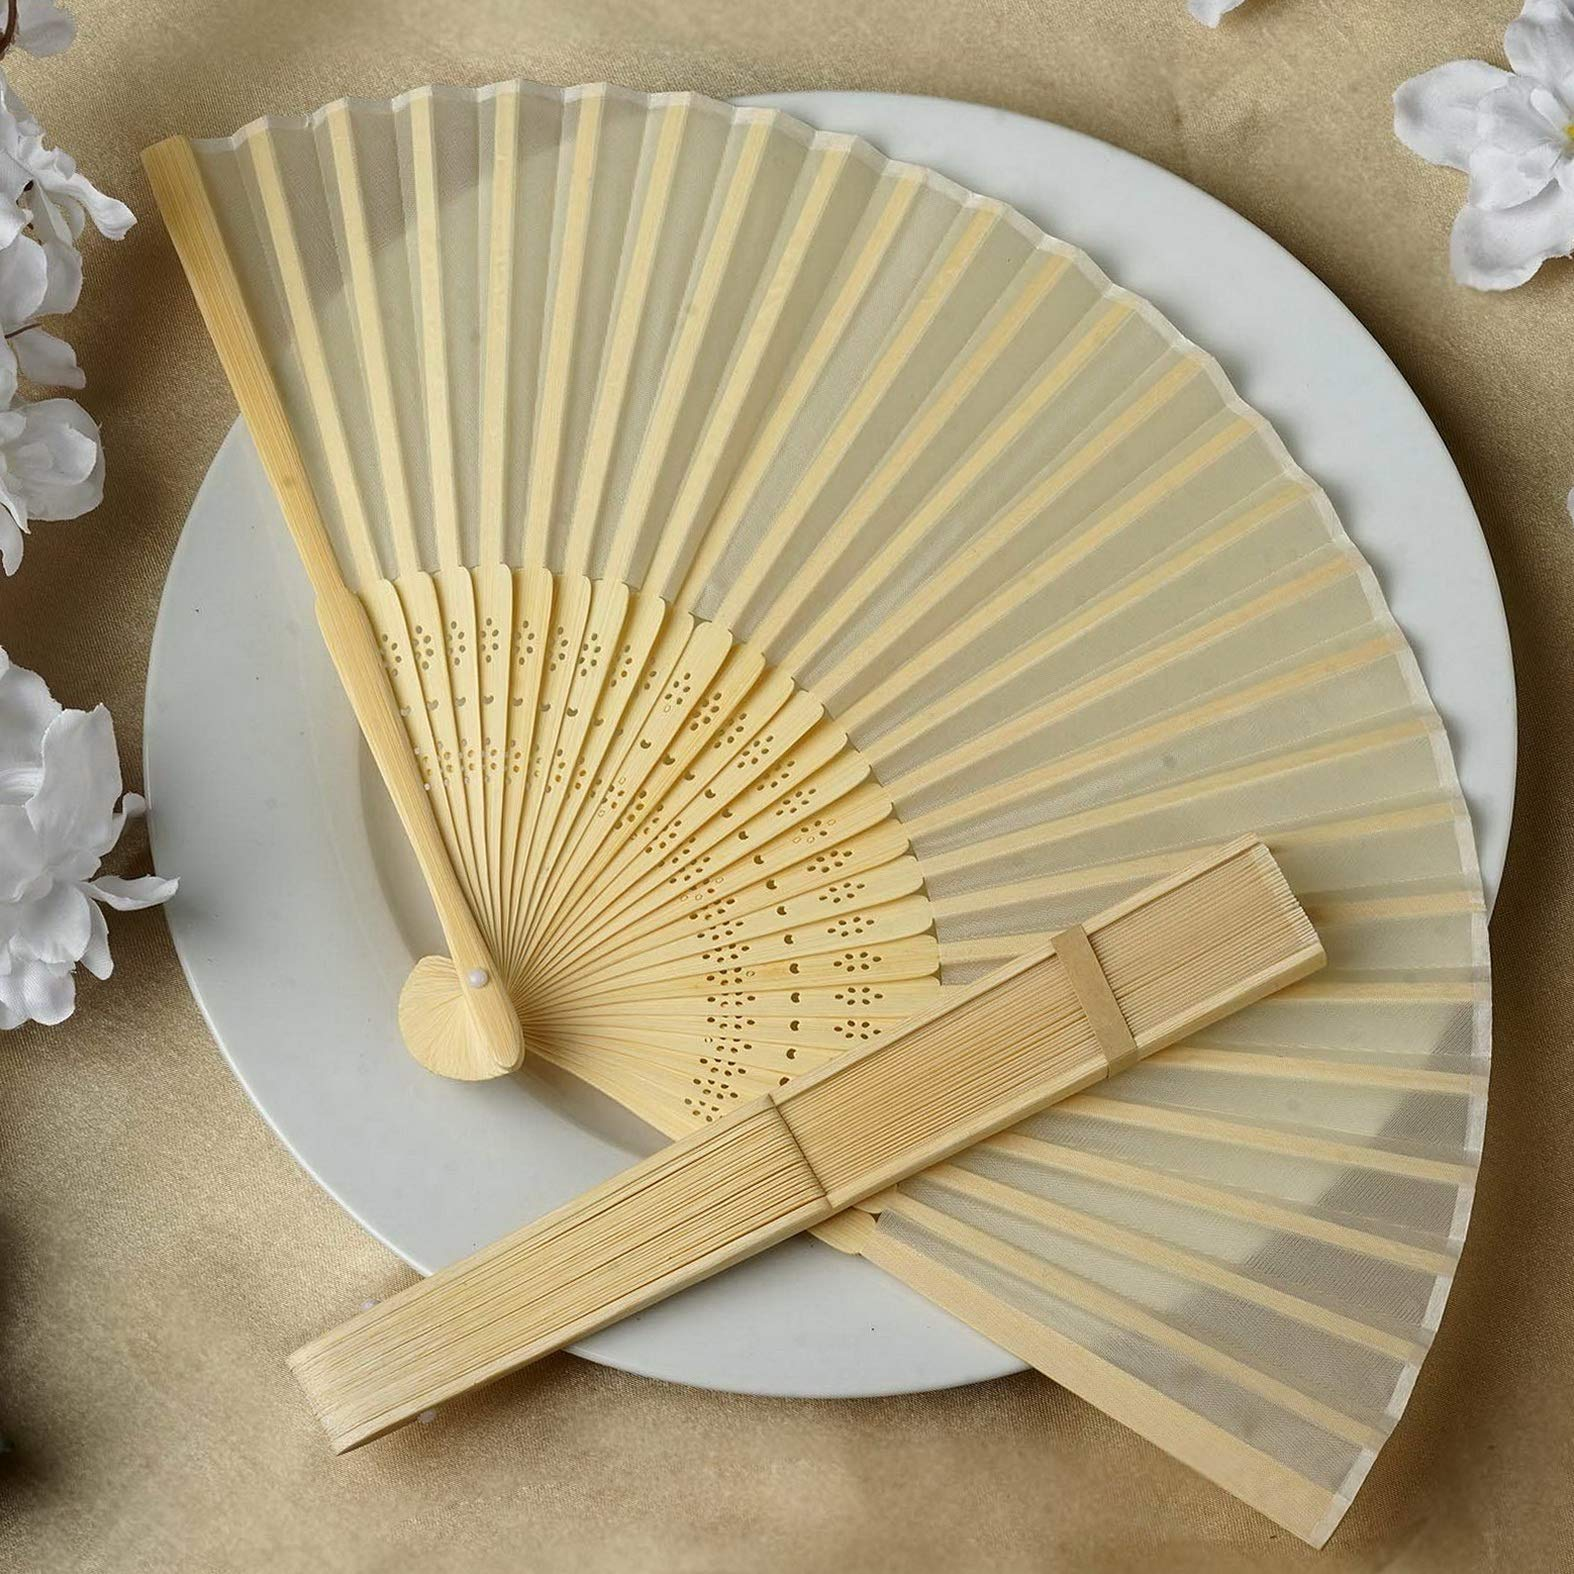 Mikash 100 Silk Folding Handheld Fans Summer Wedding Party Favors Wholesale Decorations   Model WDDNGDCRTN - 16755  